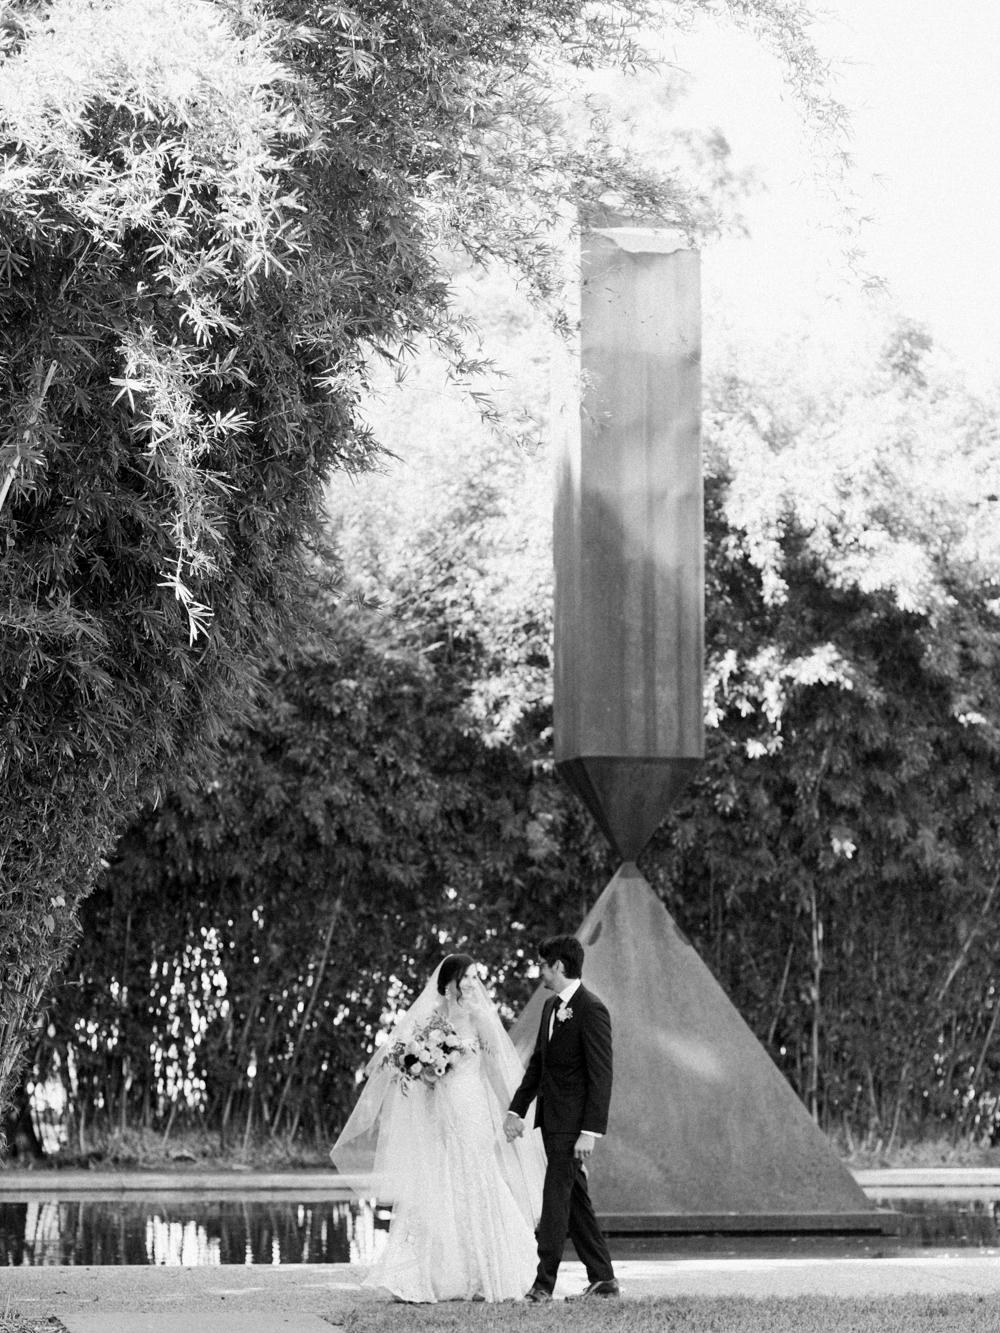 fall wedding at rothko chapel- houston wedding photographer-christine gosch - film photographer - elopement photographer- intimate wedding - lovely bride wedding gown-16.jpg